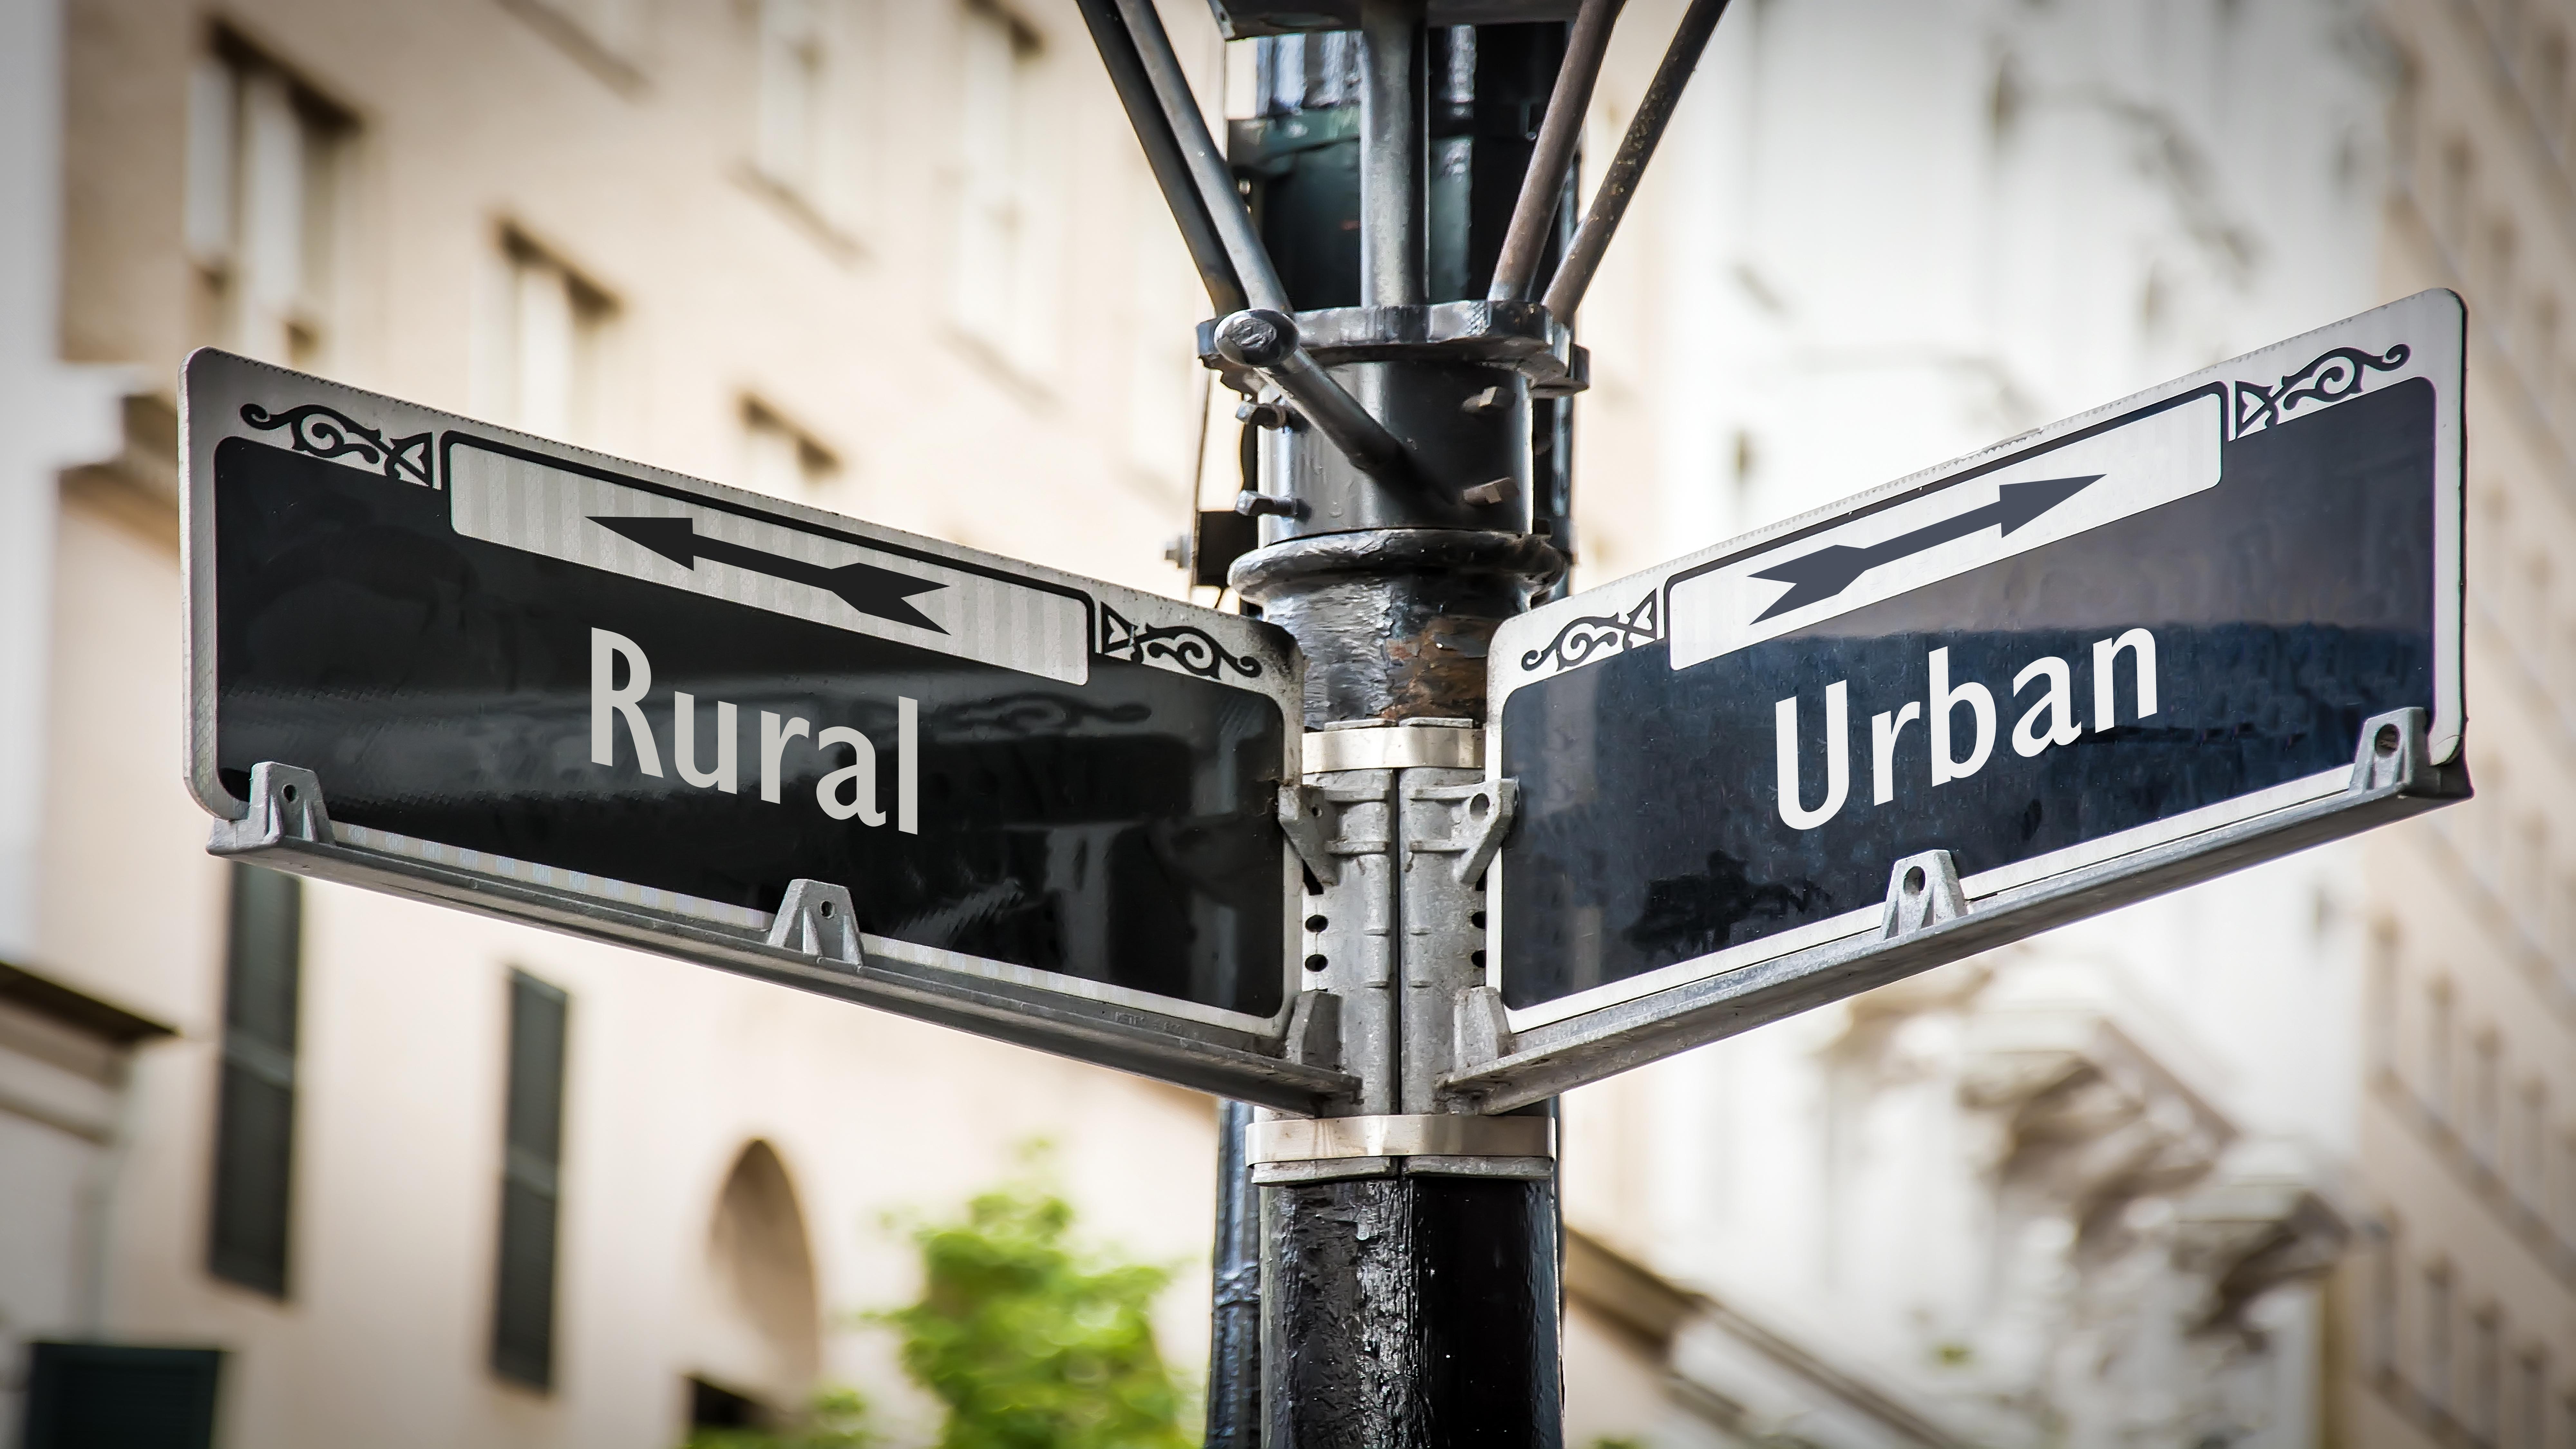 urban vs rural picture